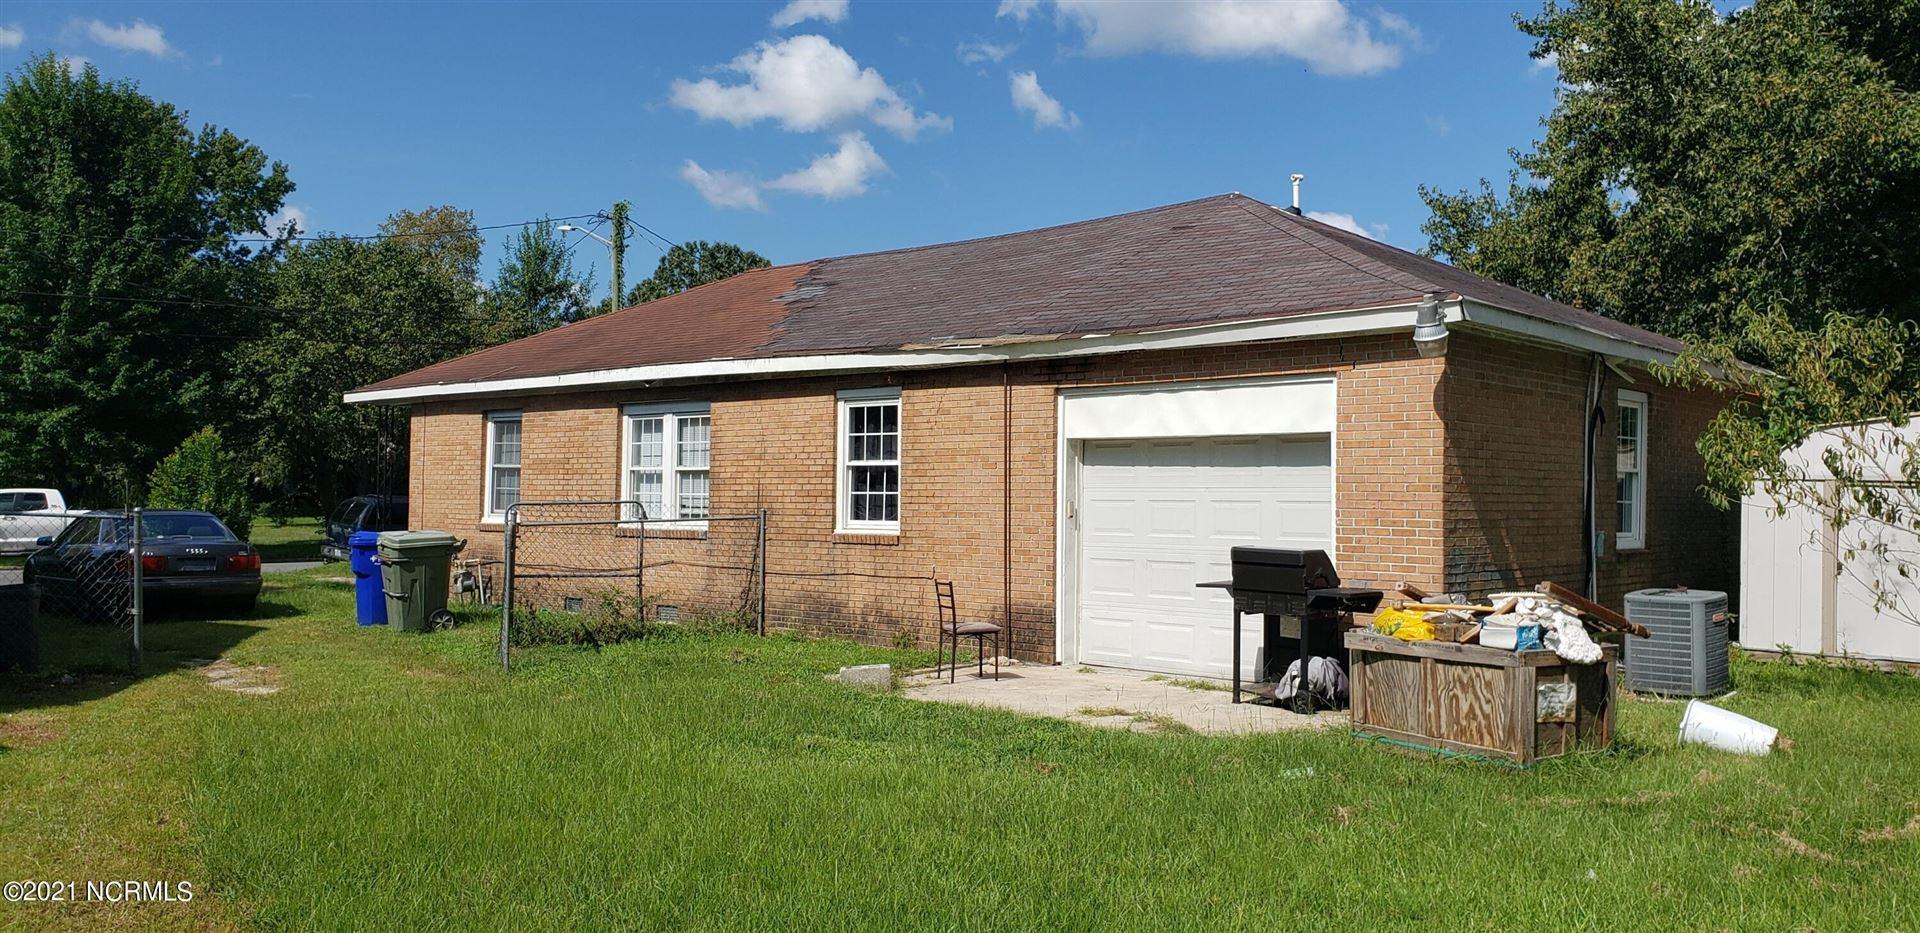 Photo of 712 Vanderbilt Lane, Greenville, NC 27834 (MLS # 100288755)